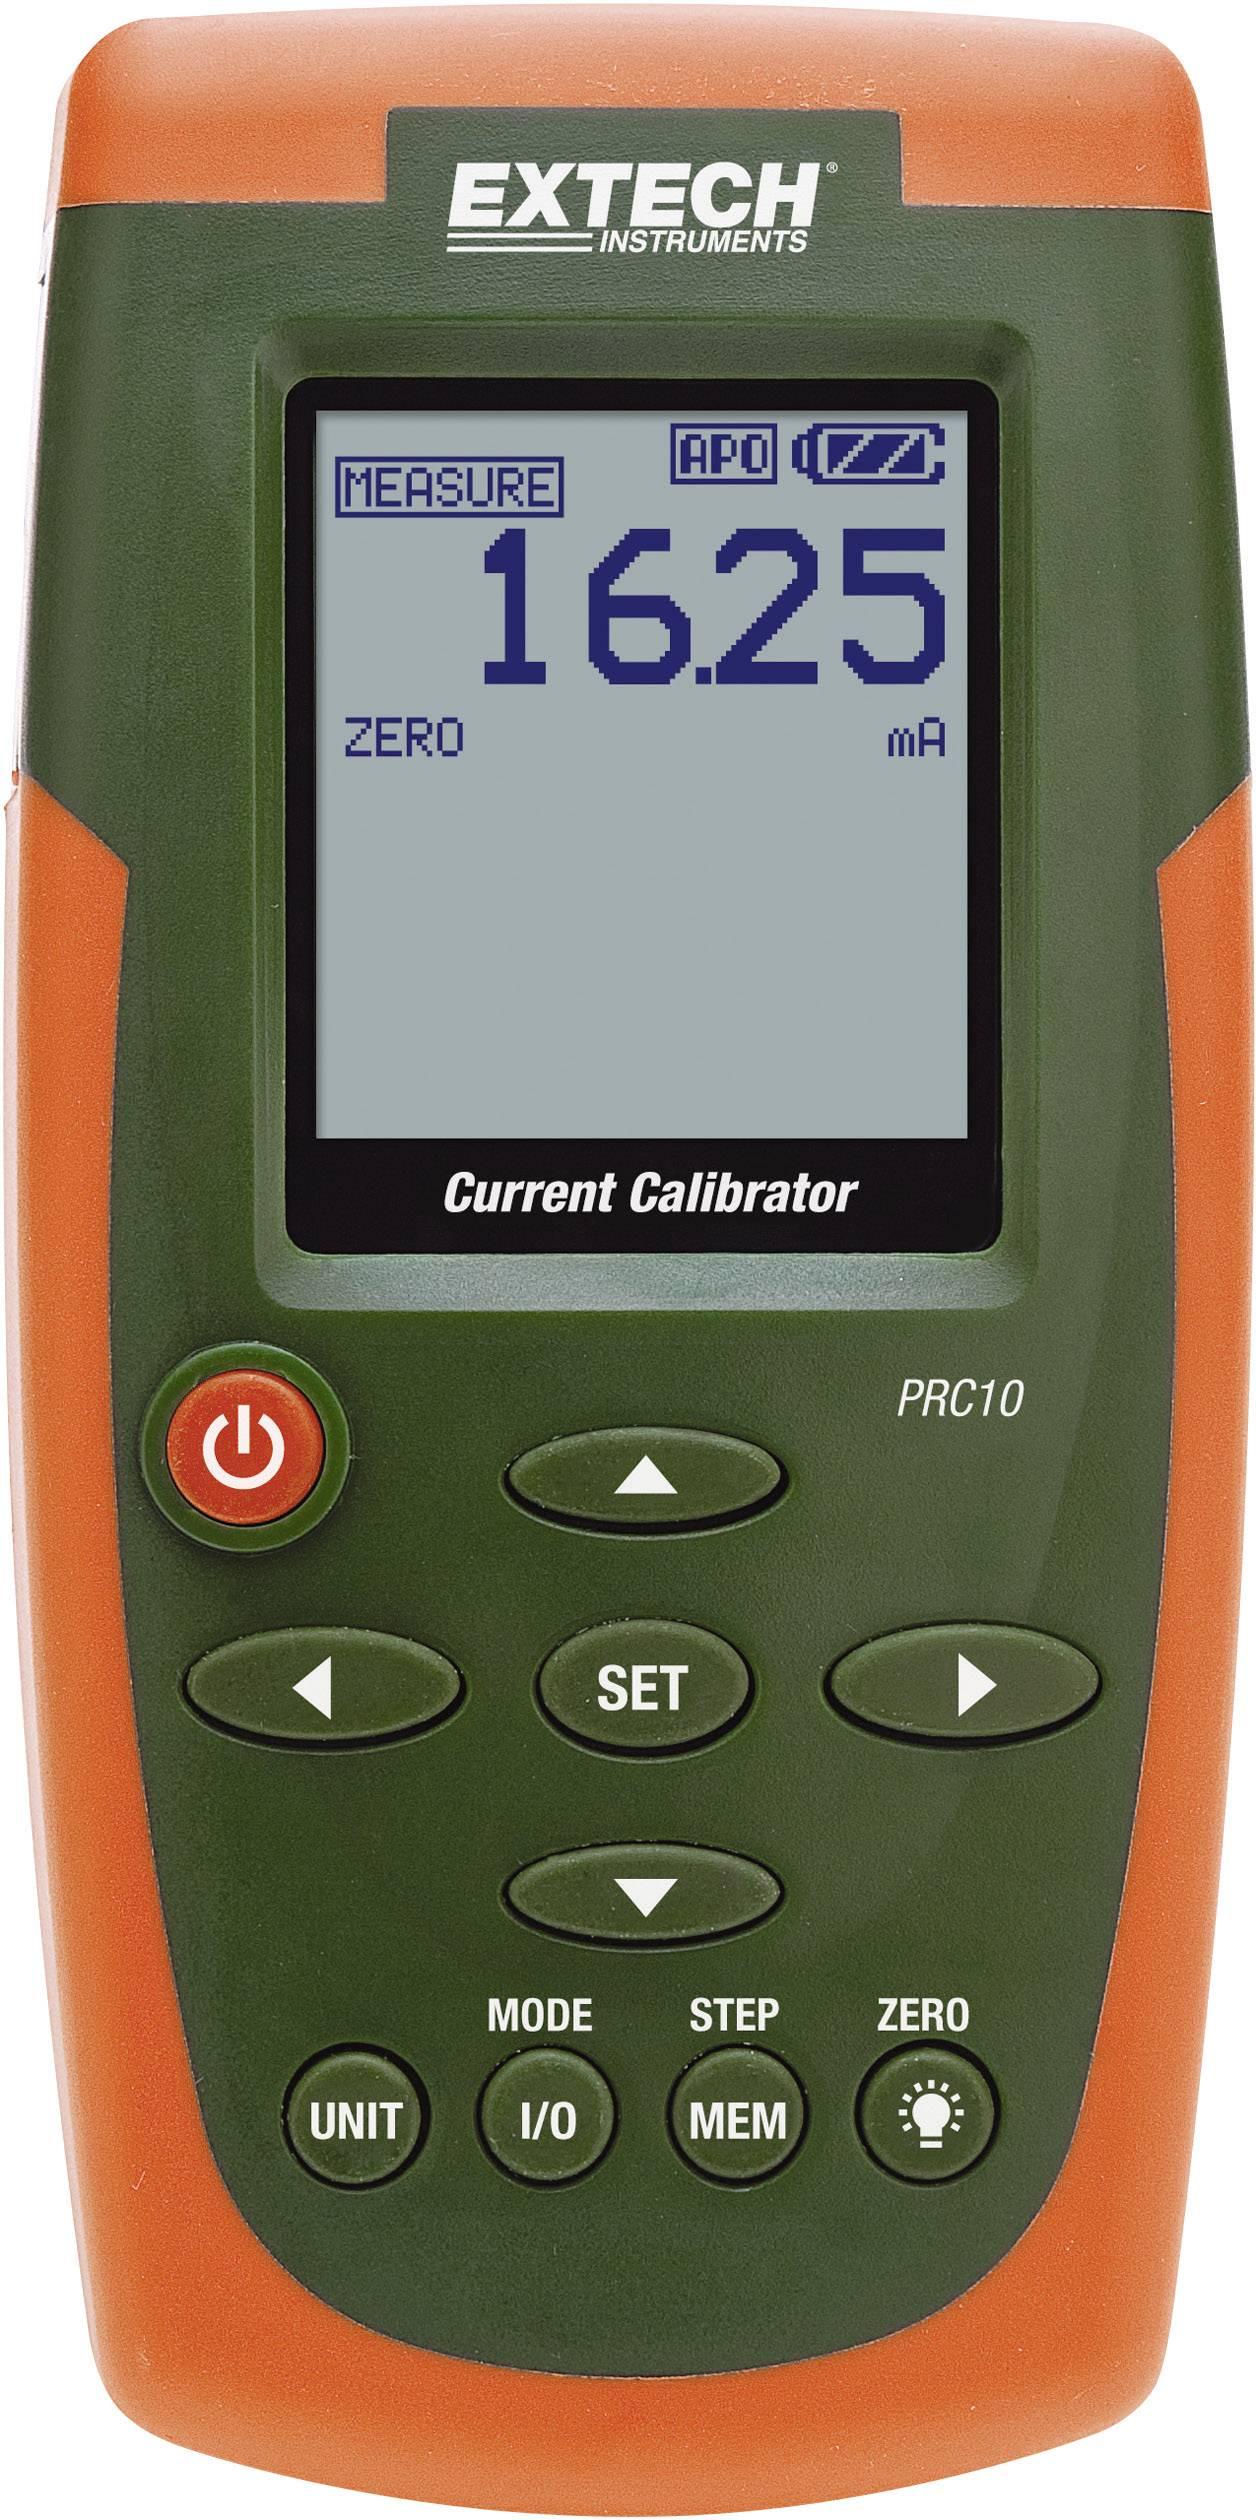 Prúdový kalibrátor Extech PRC10